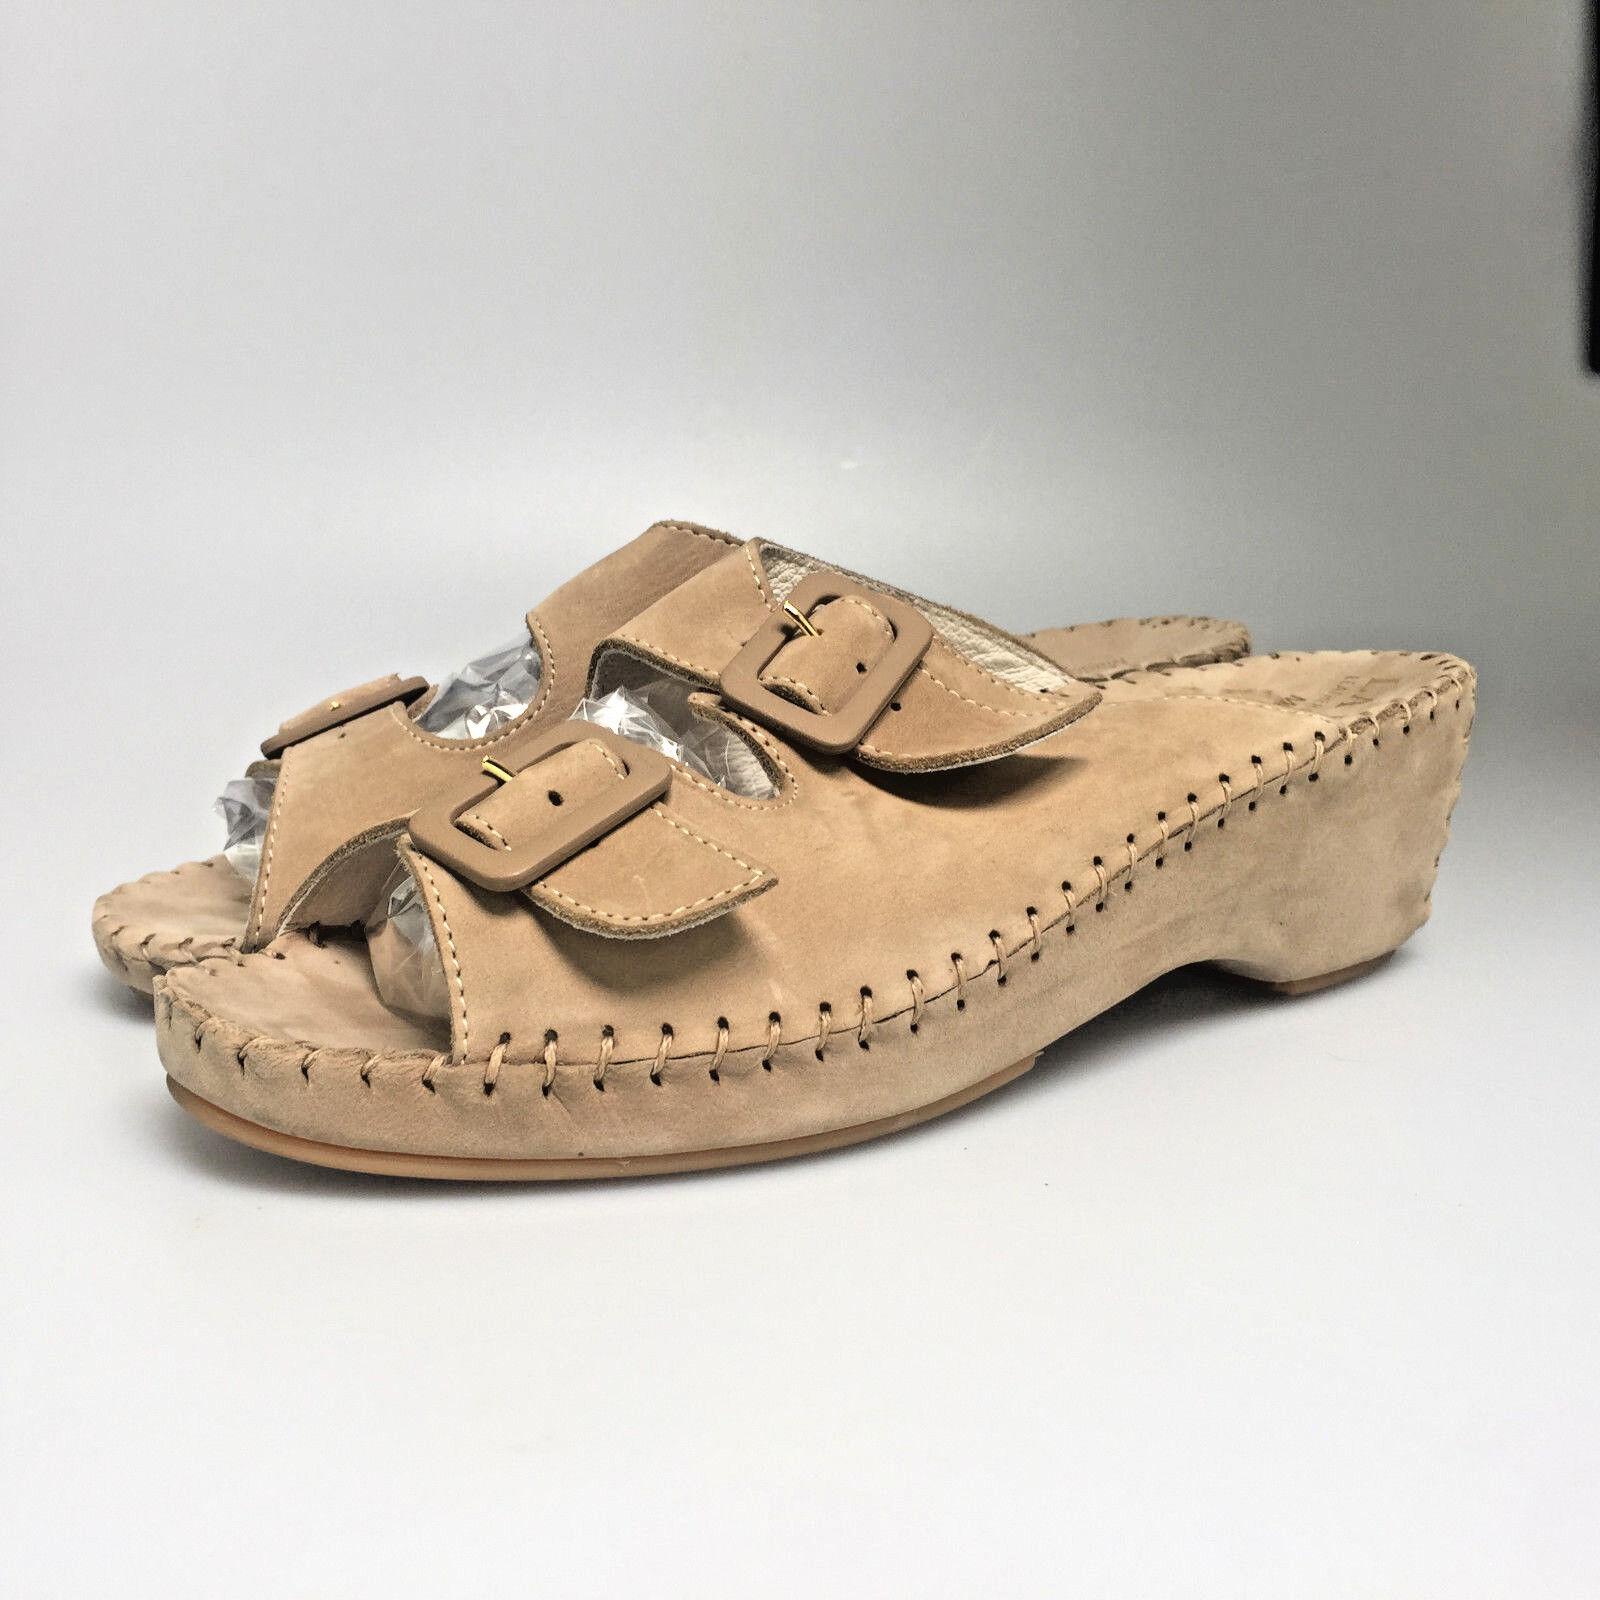 La Plume Damenschuhe Sandales Jen Größe 41 Tan Braun Designer Leder Schuhes 10 US